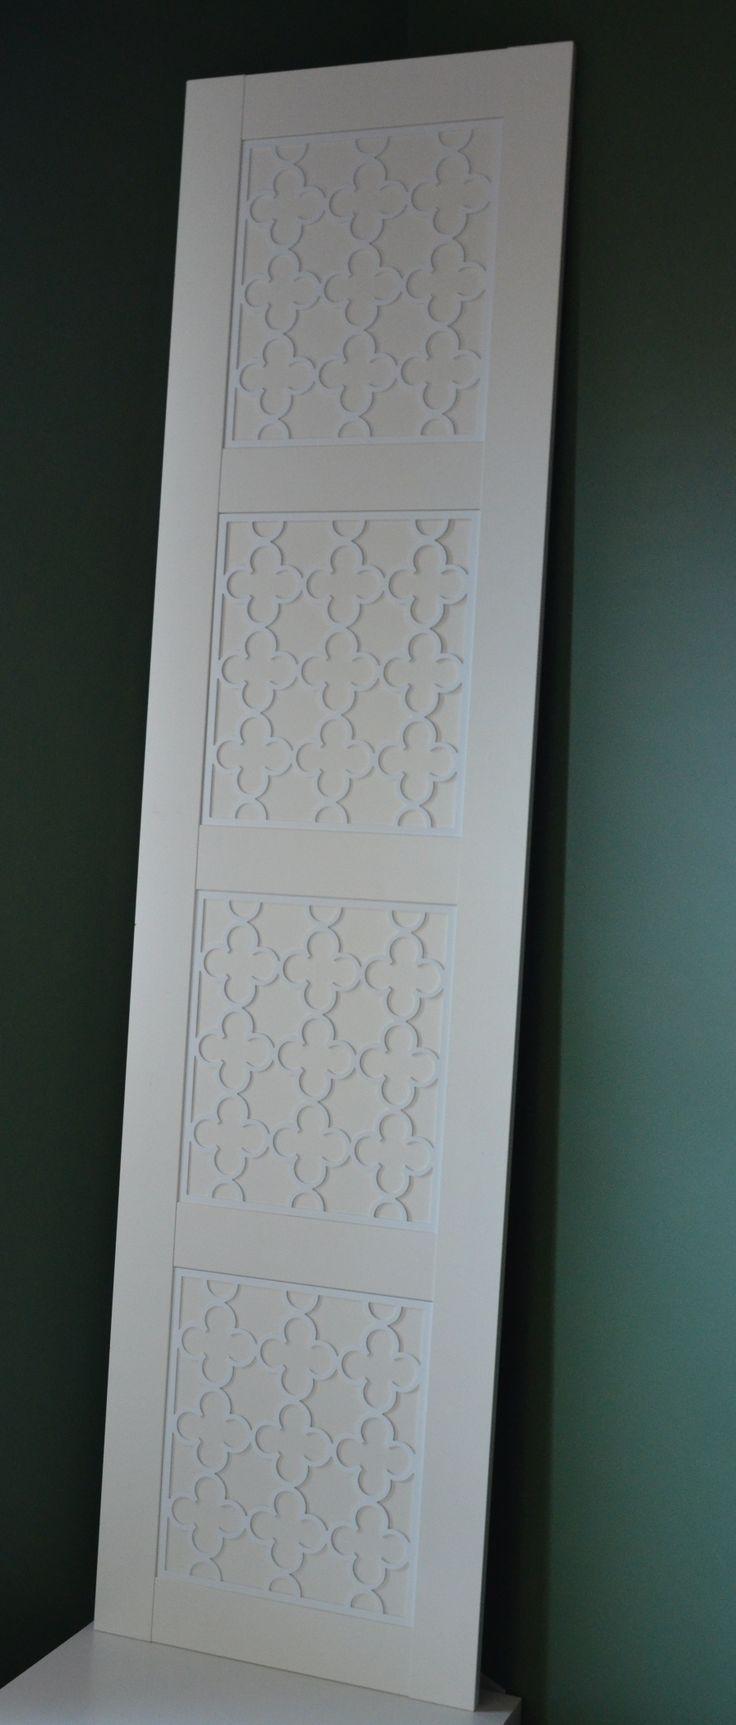 Cool Idee Relooking Cuisine Overlay Quatrefoil For Ikea Pax